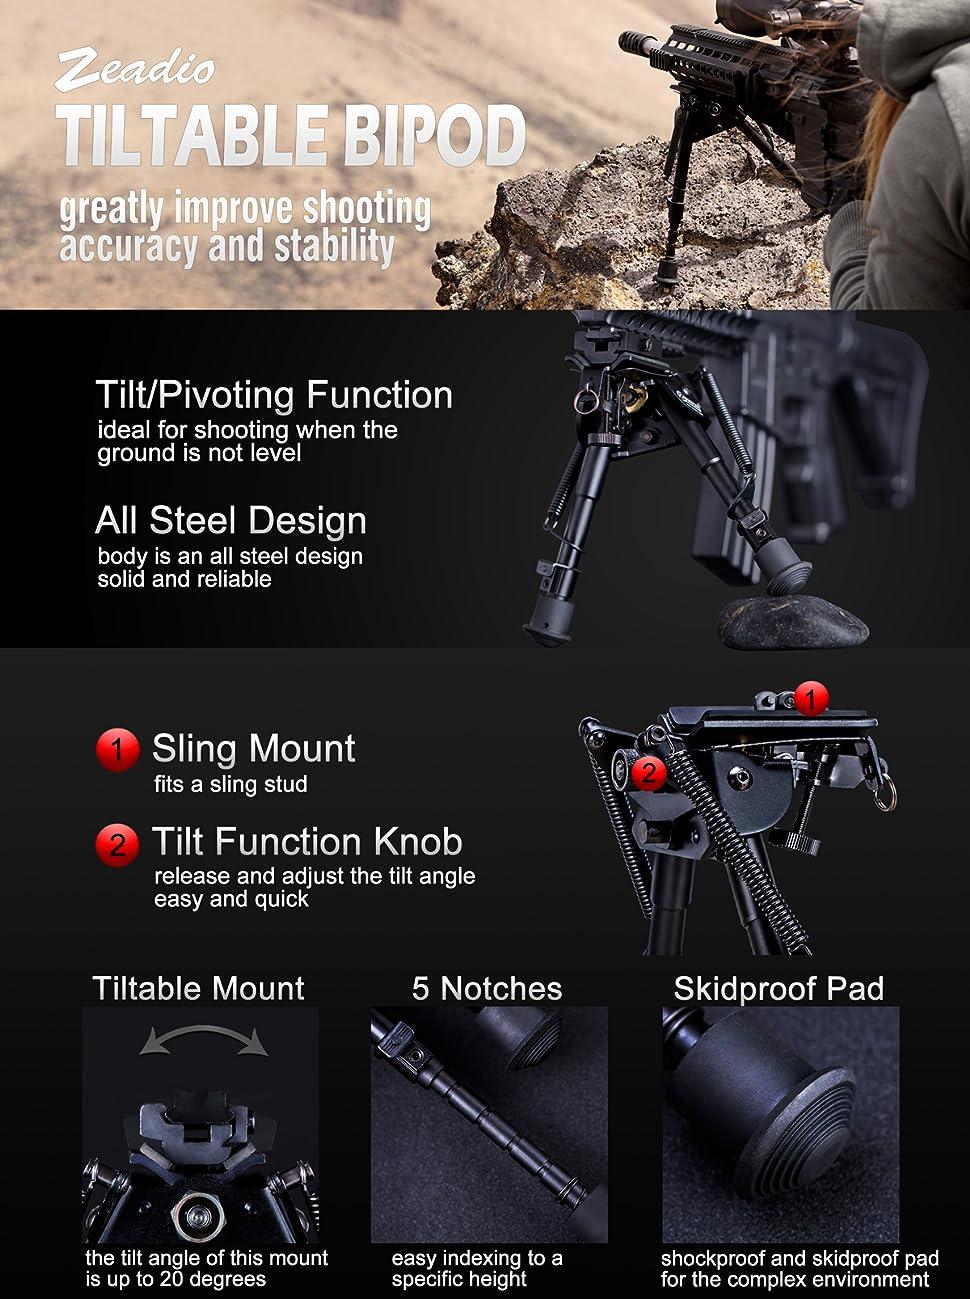 6-9 Zeadio Carbon Fiber Swivel Pivot Tiltable Bipod with Sling Mount